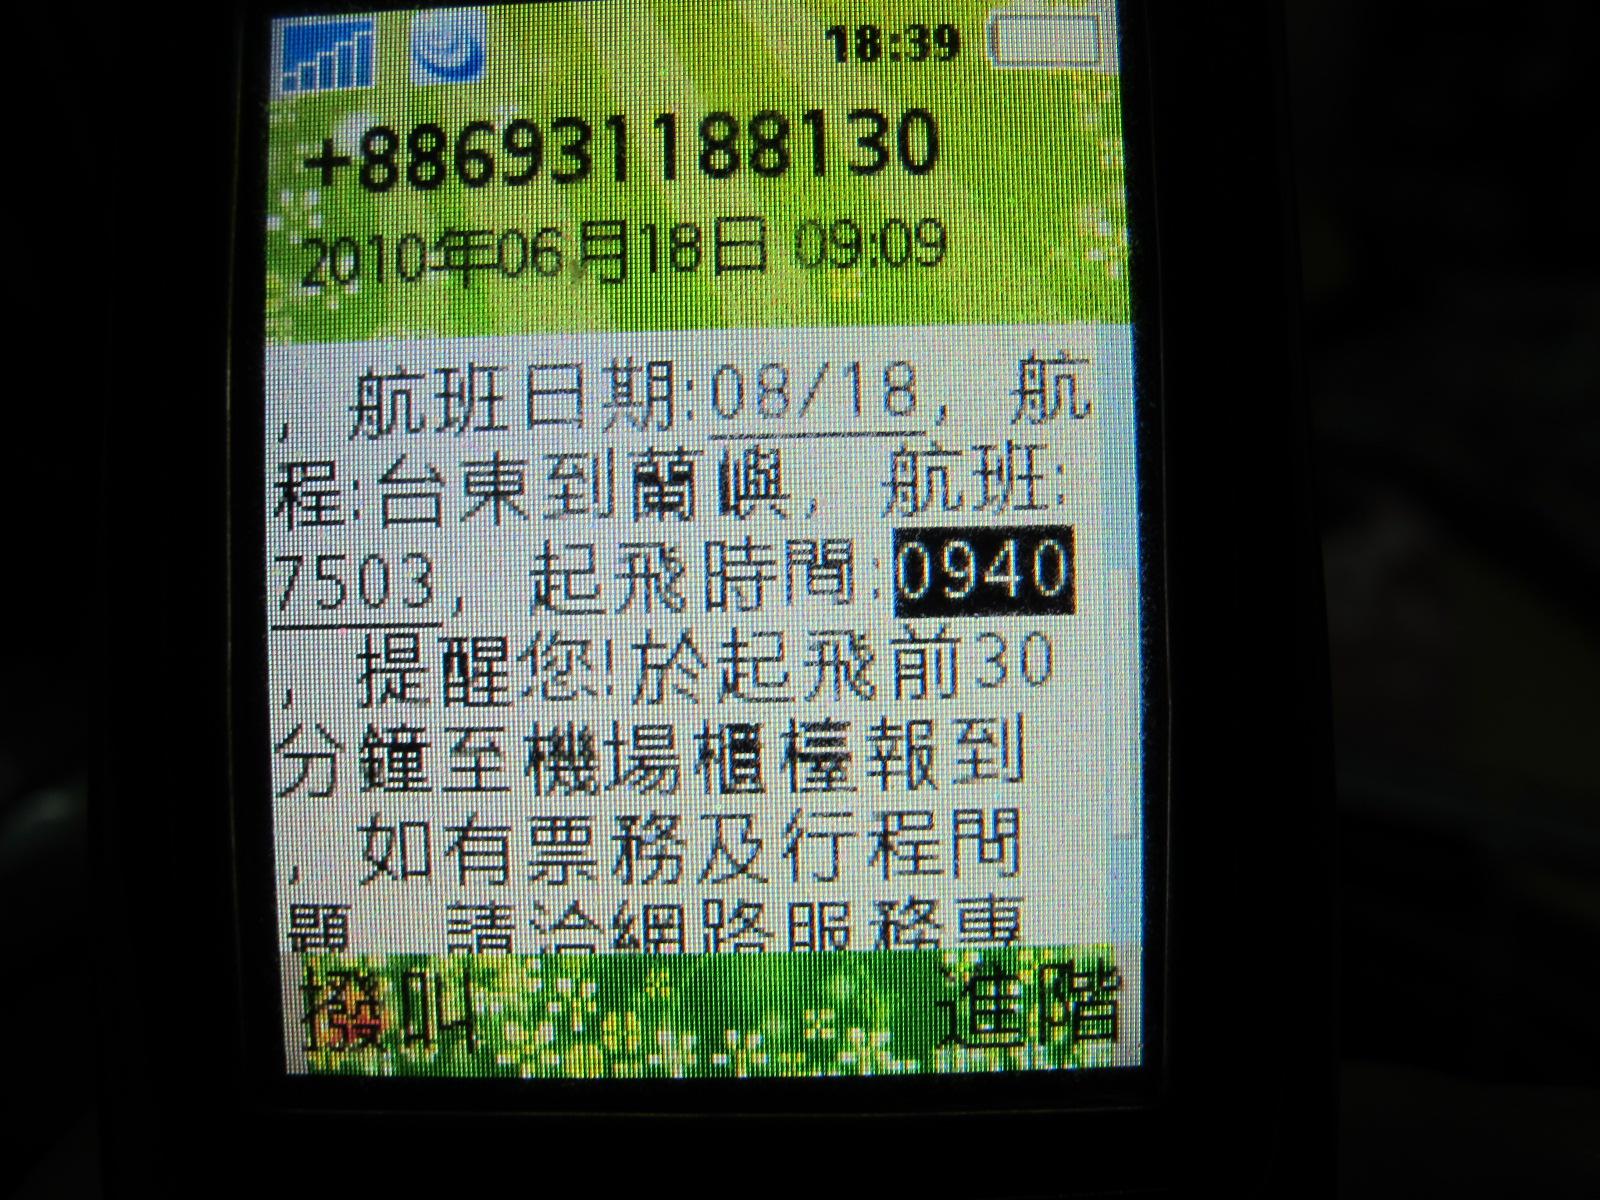 IMG_4405.JPG